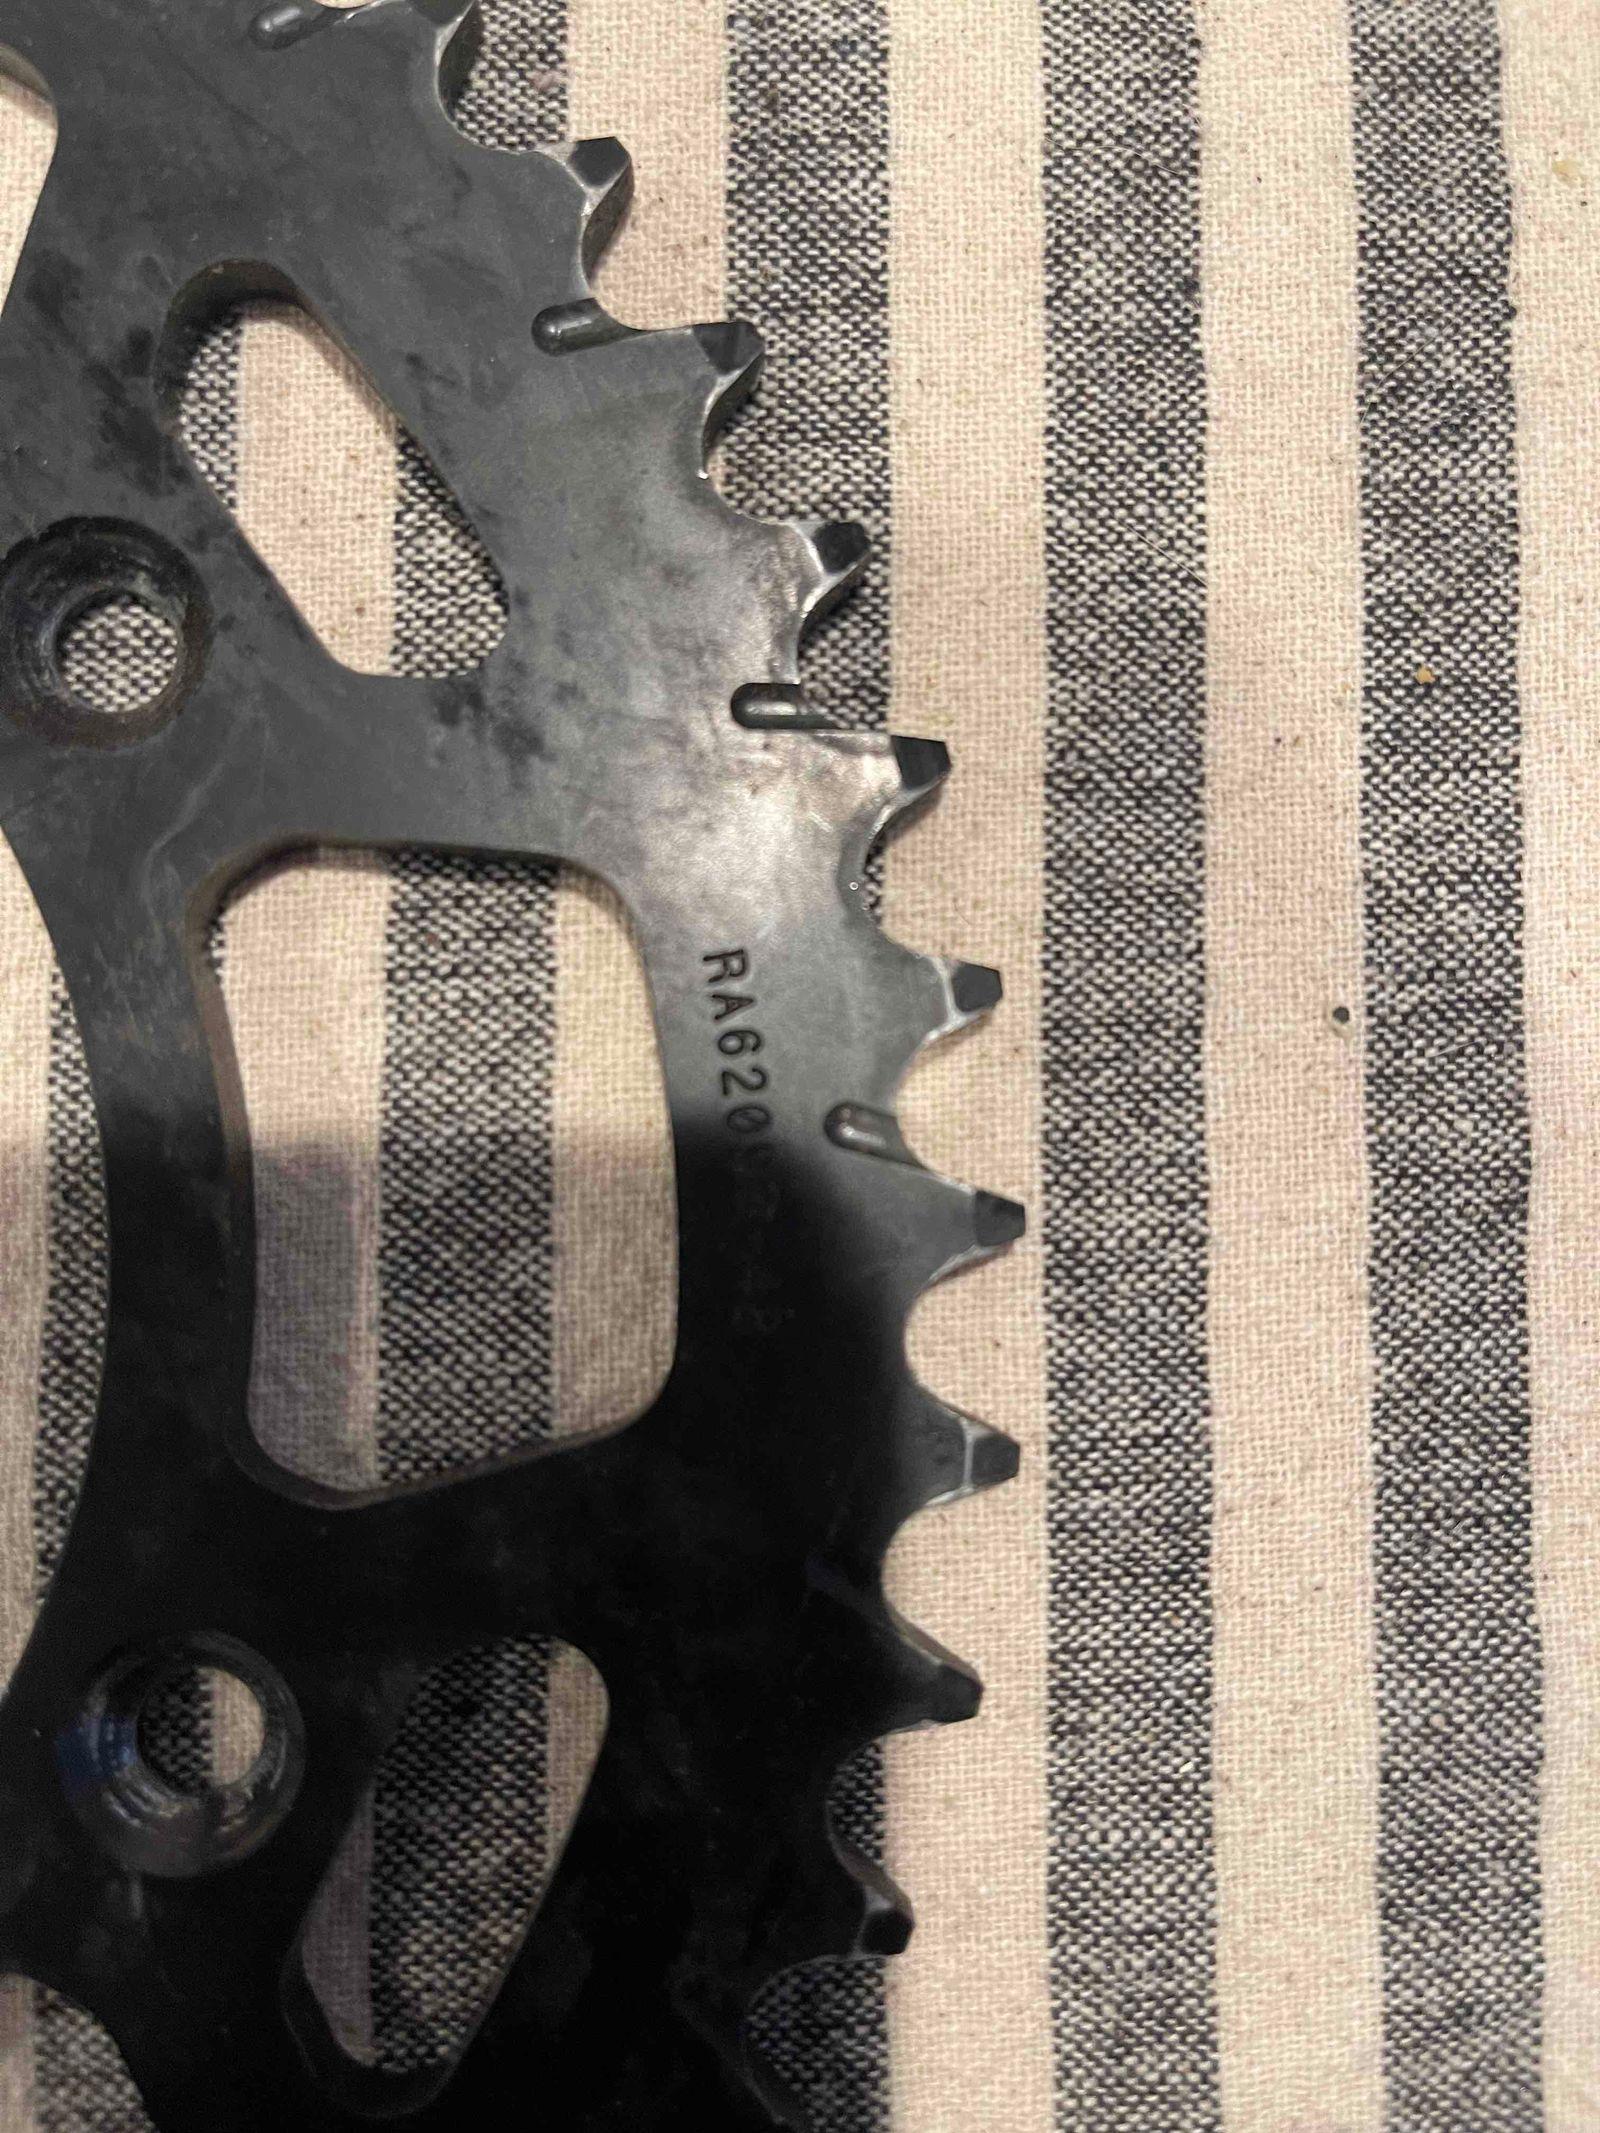 48 Tooth Aluminum Sprocket Ktm/Husqvarna Big Bikes